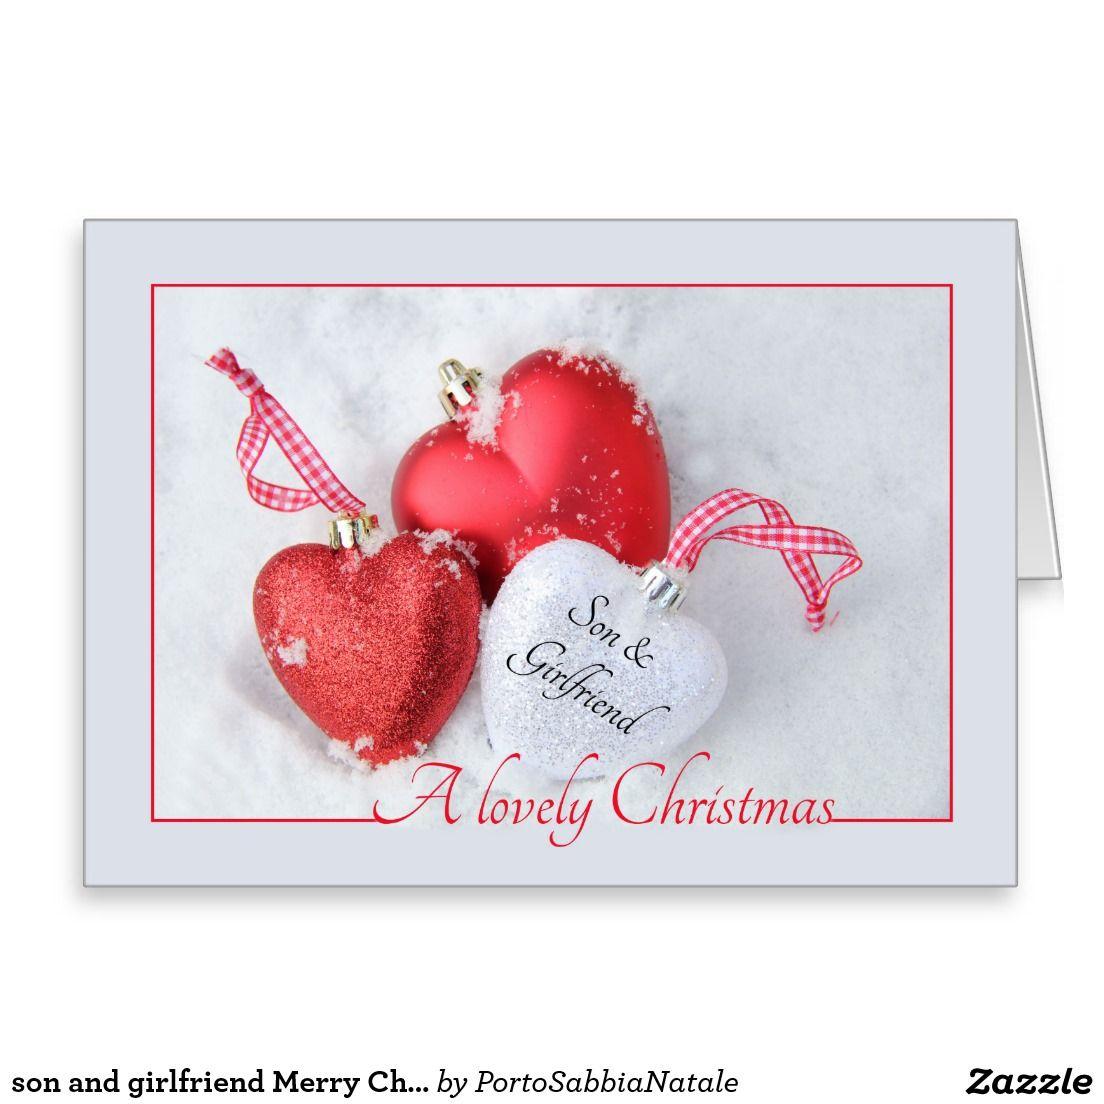 son and girlfriend Merry Christmas card | Merry christmas card